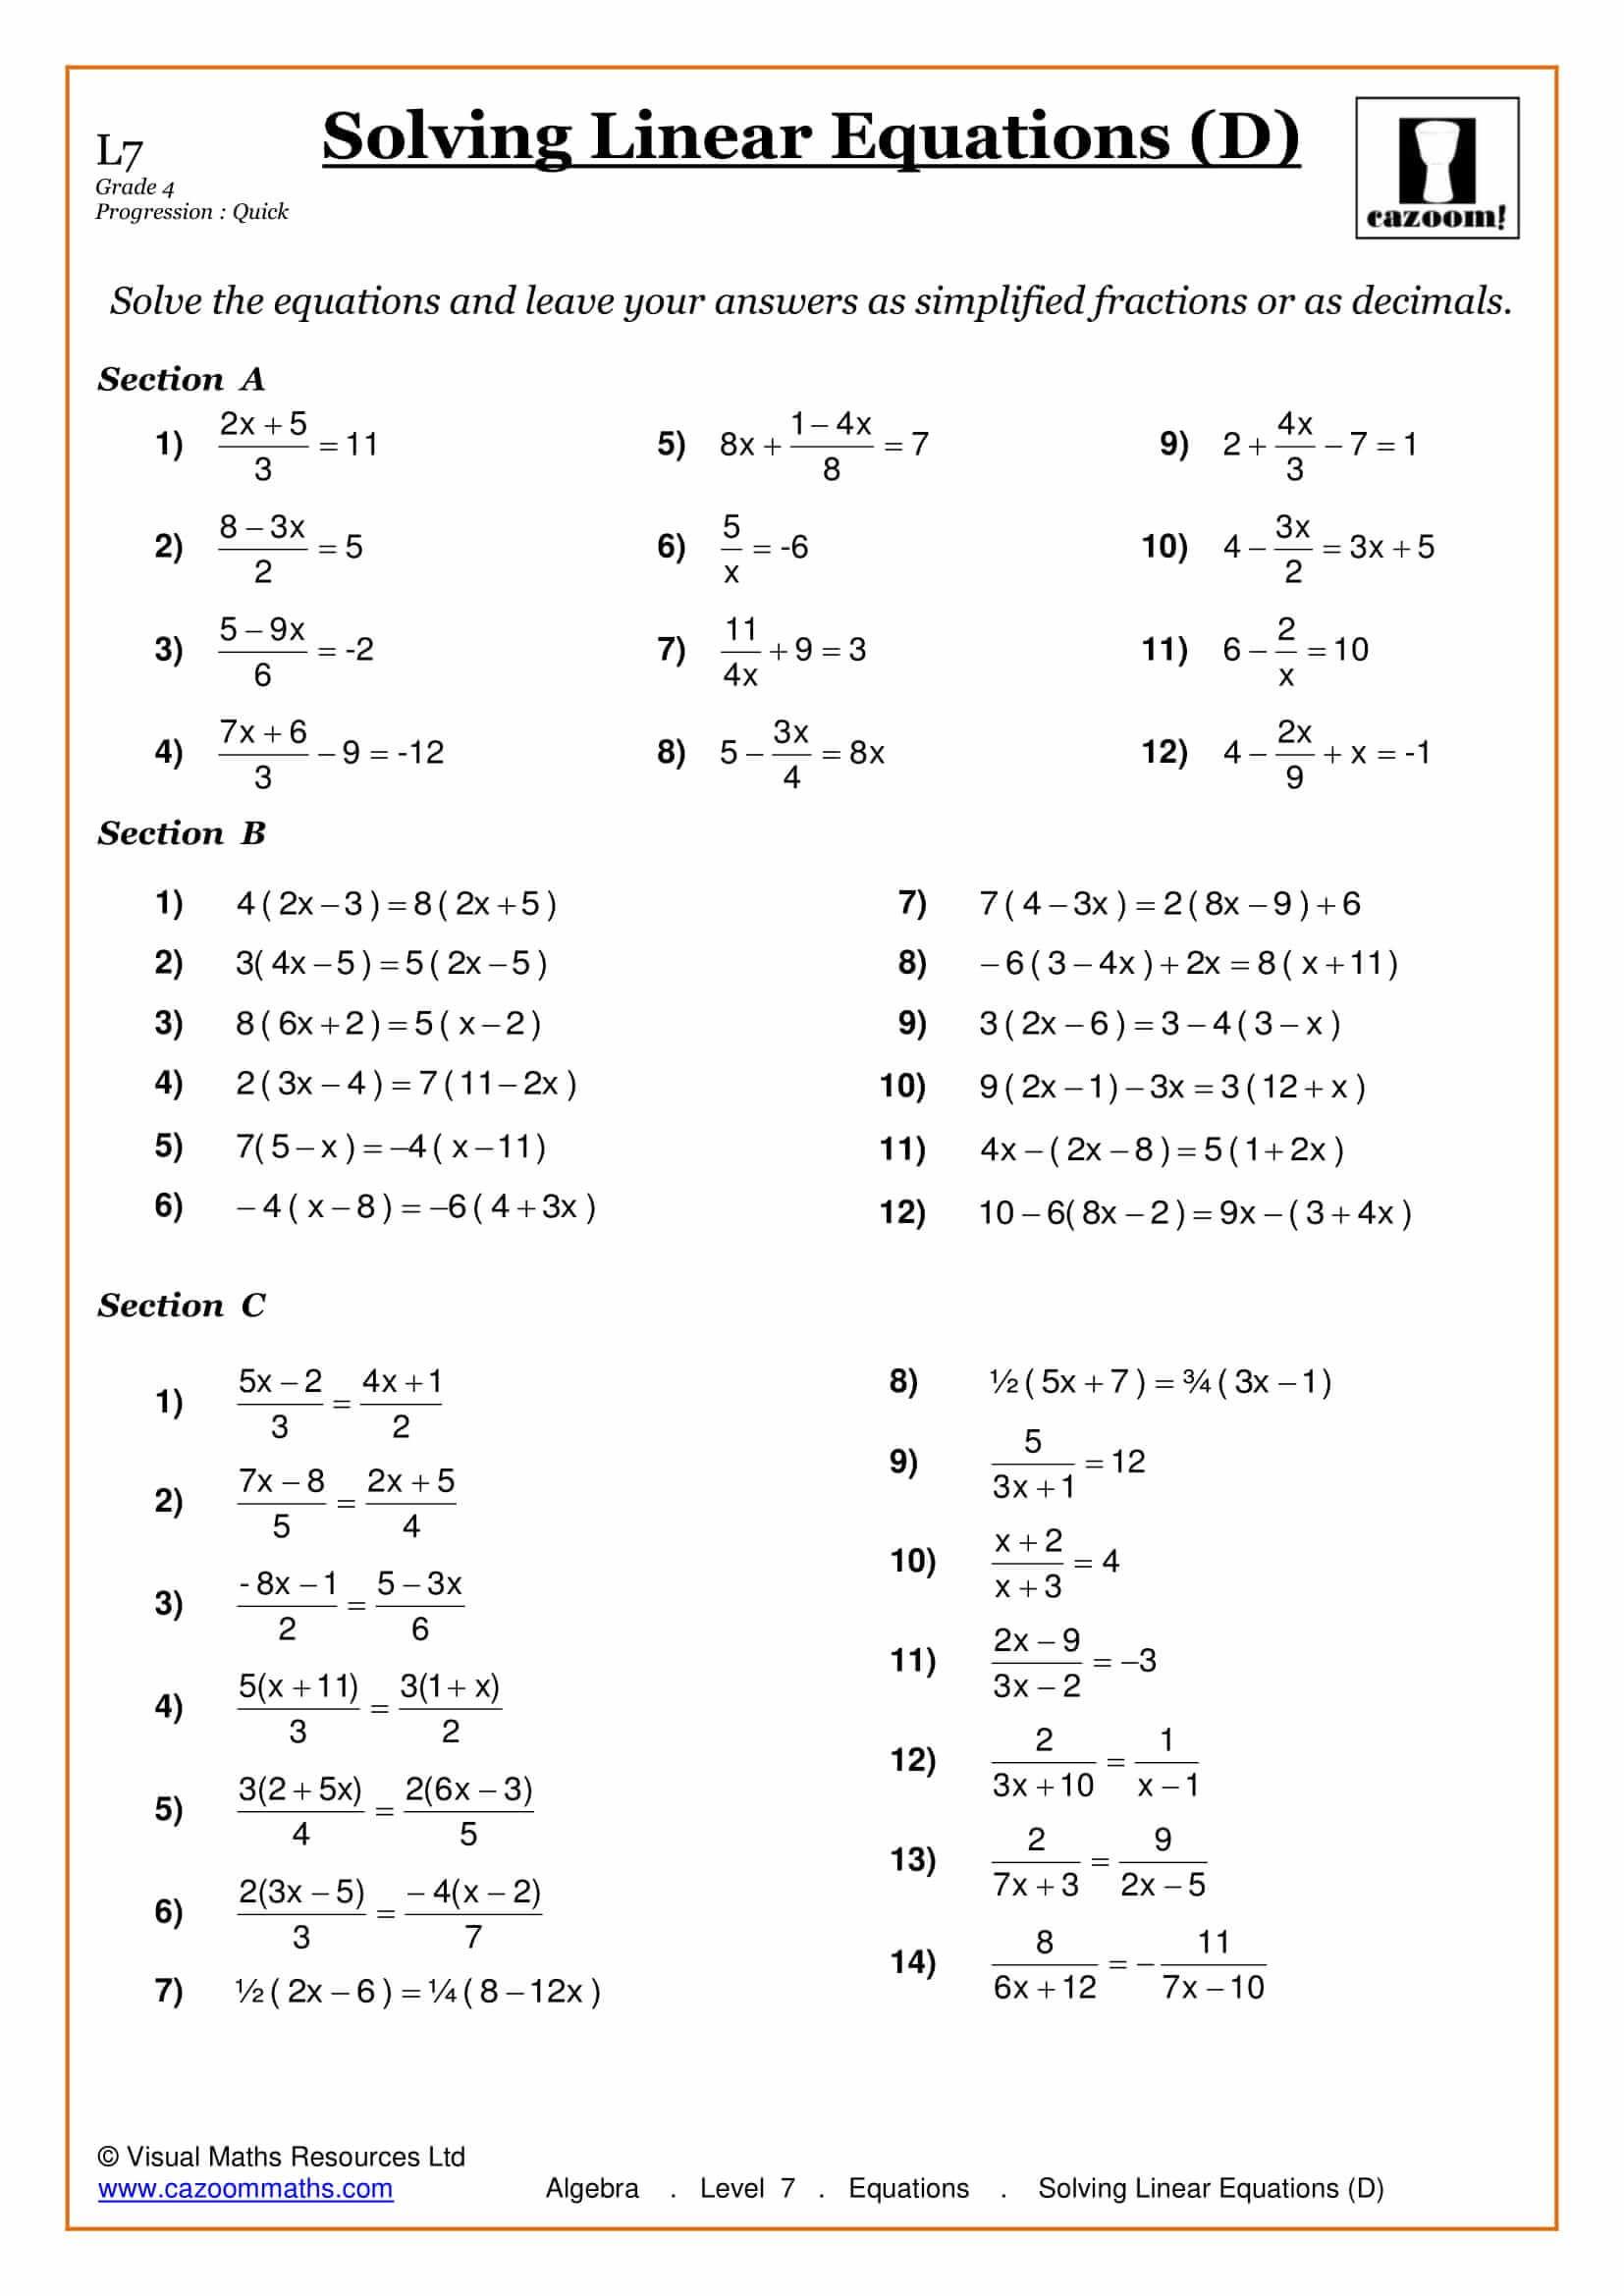 Solving Equations Maths Worksheet - cazoommaths.com ...